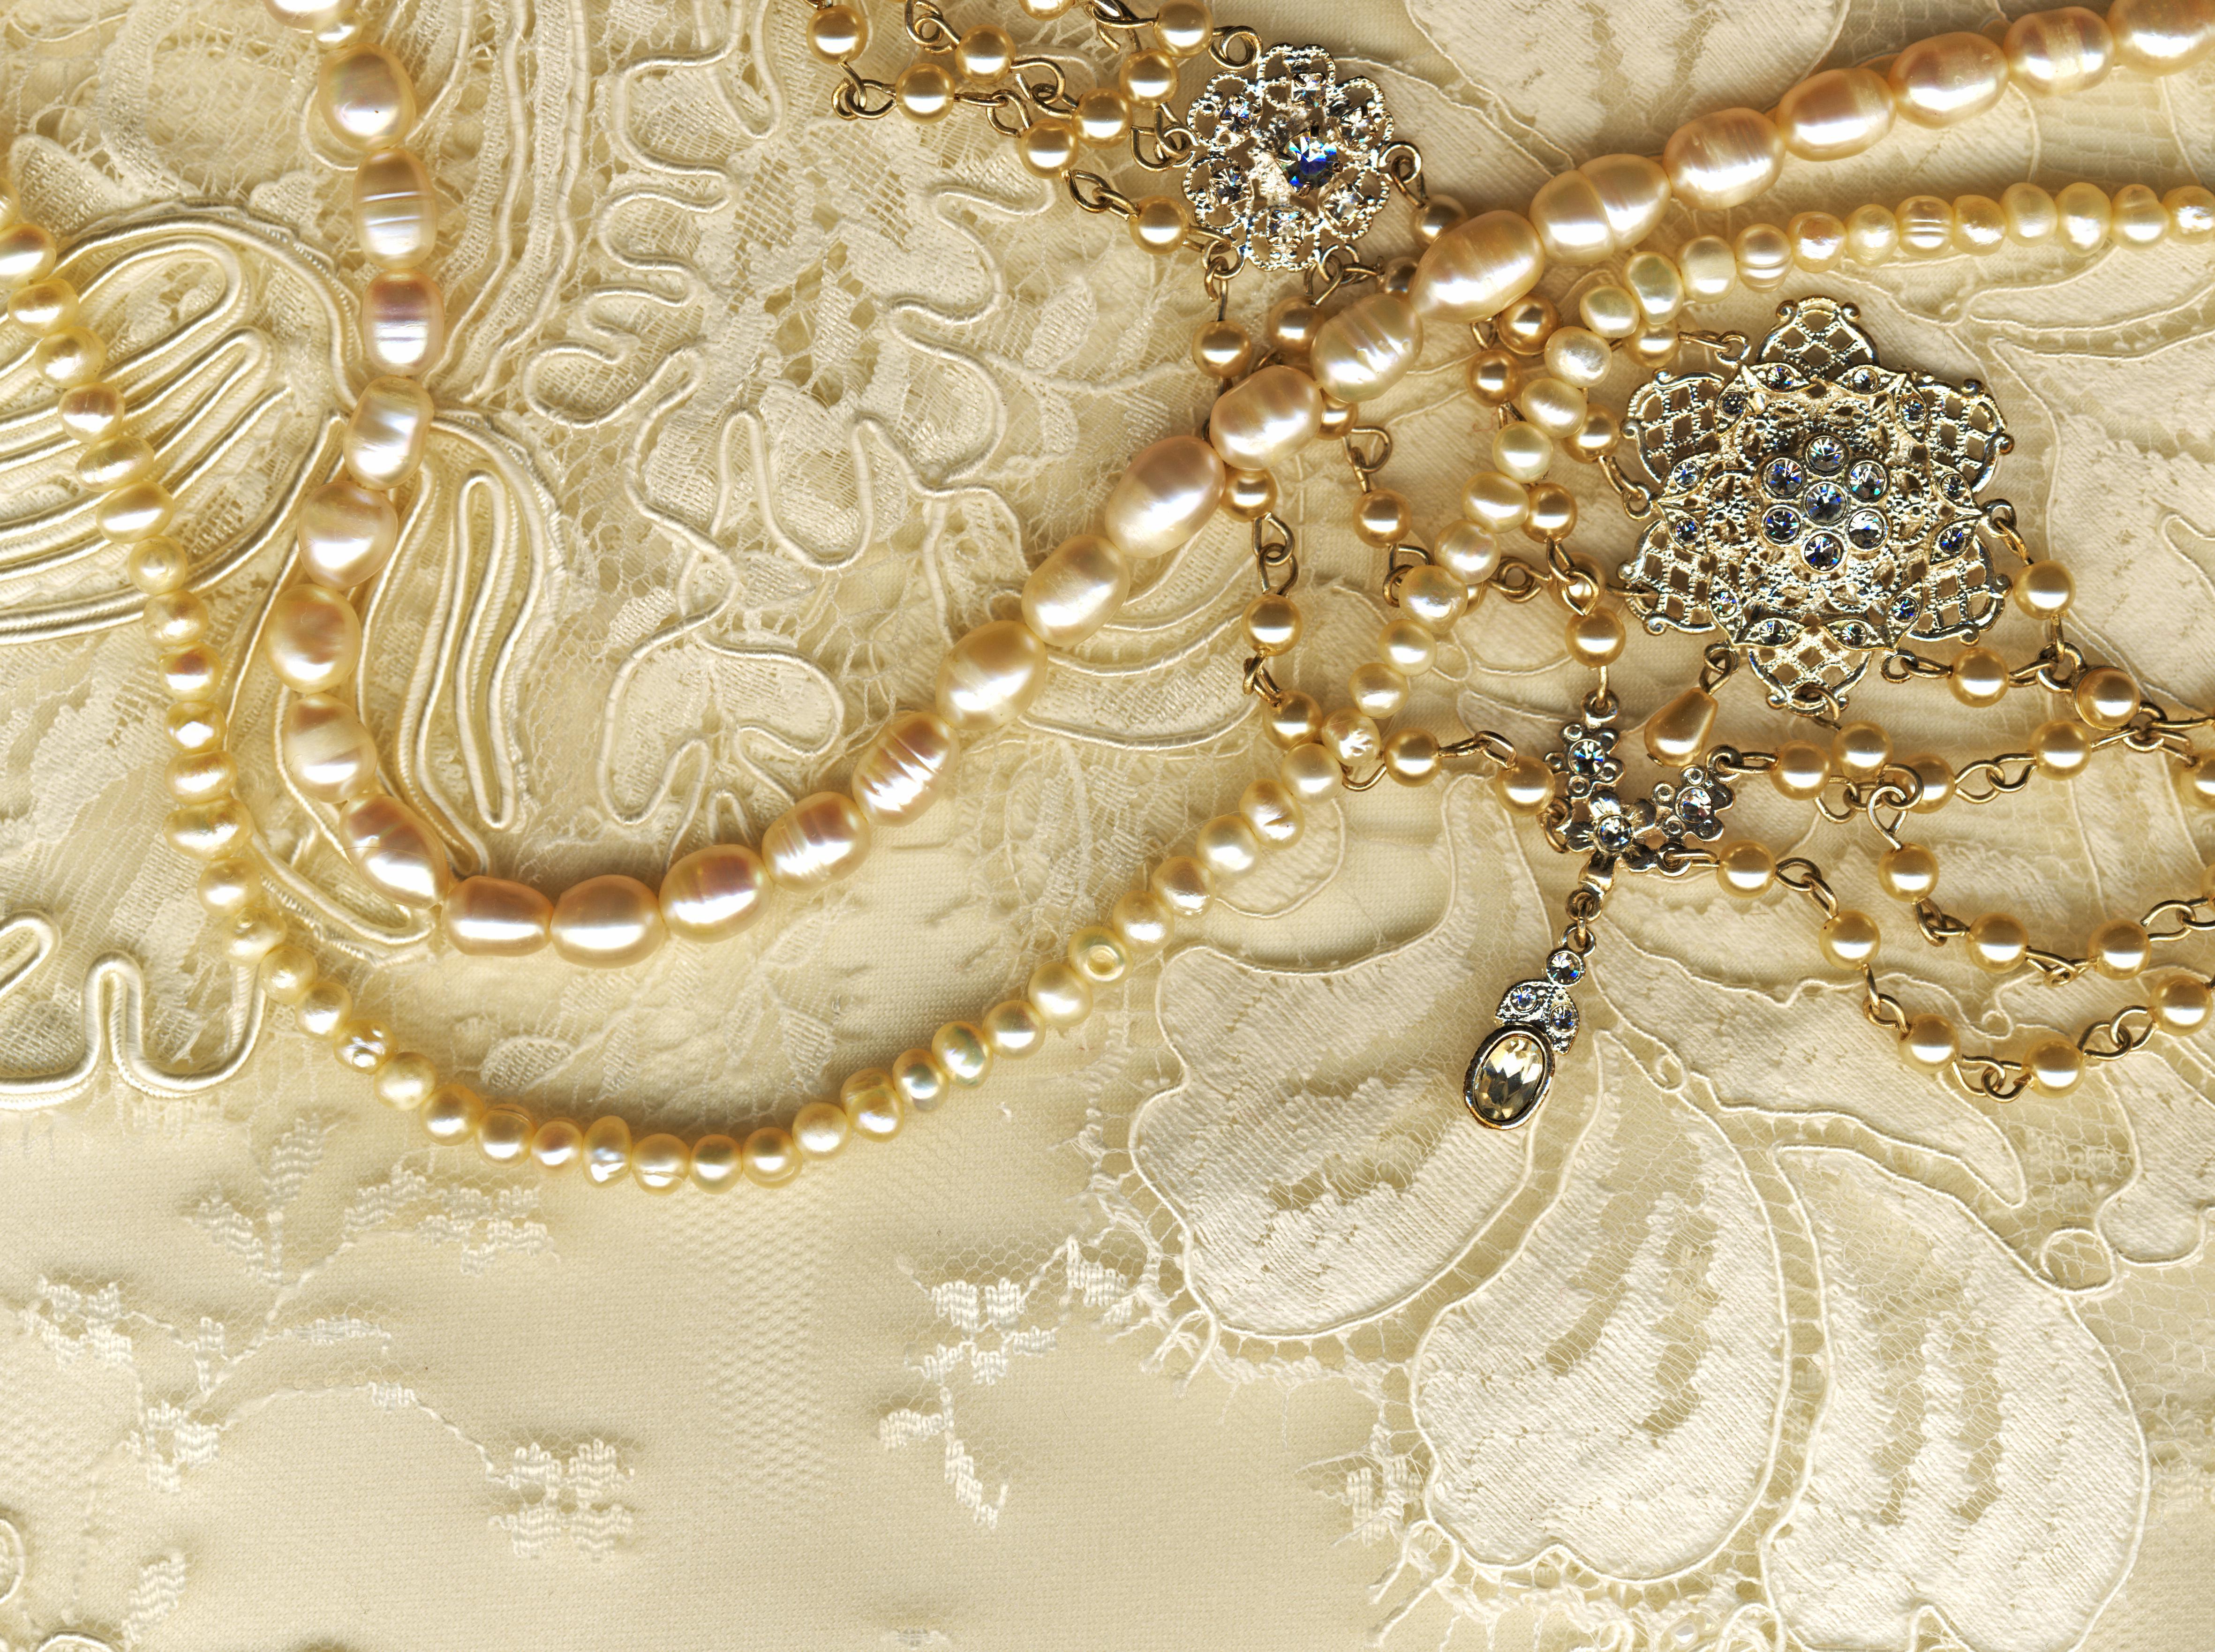 WEDDING DAY WALLPAPER   140857   HD Wallpapers   [wallpapersinhqpw 4724x3524